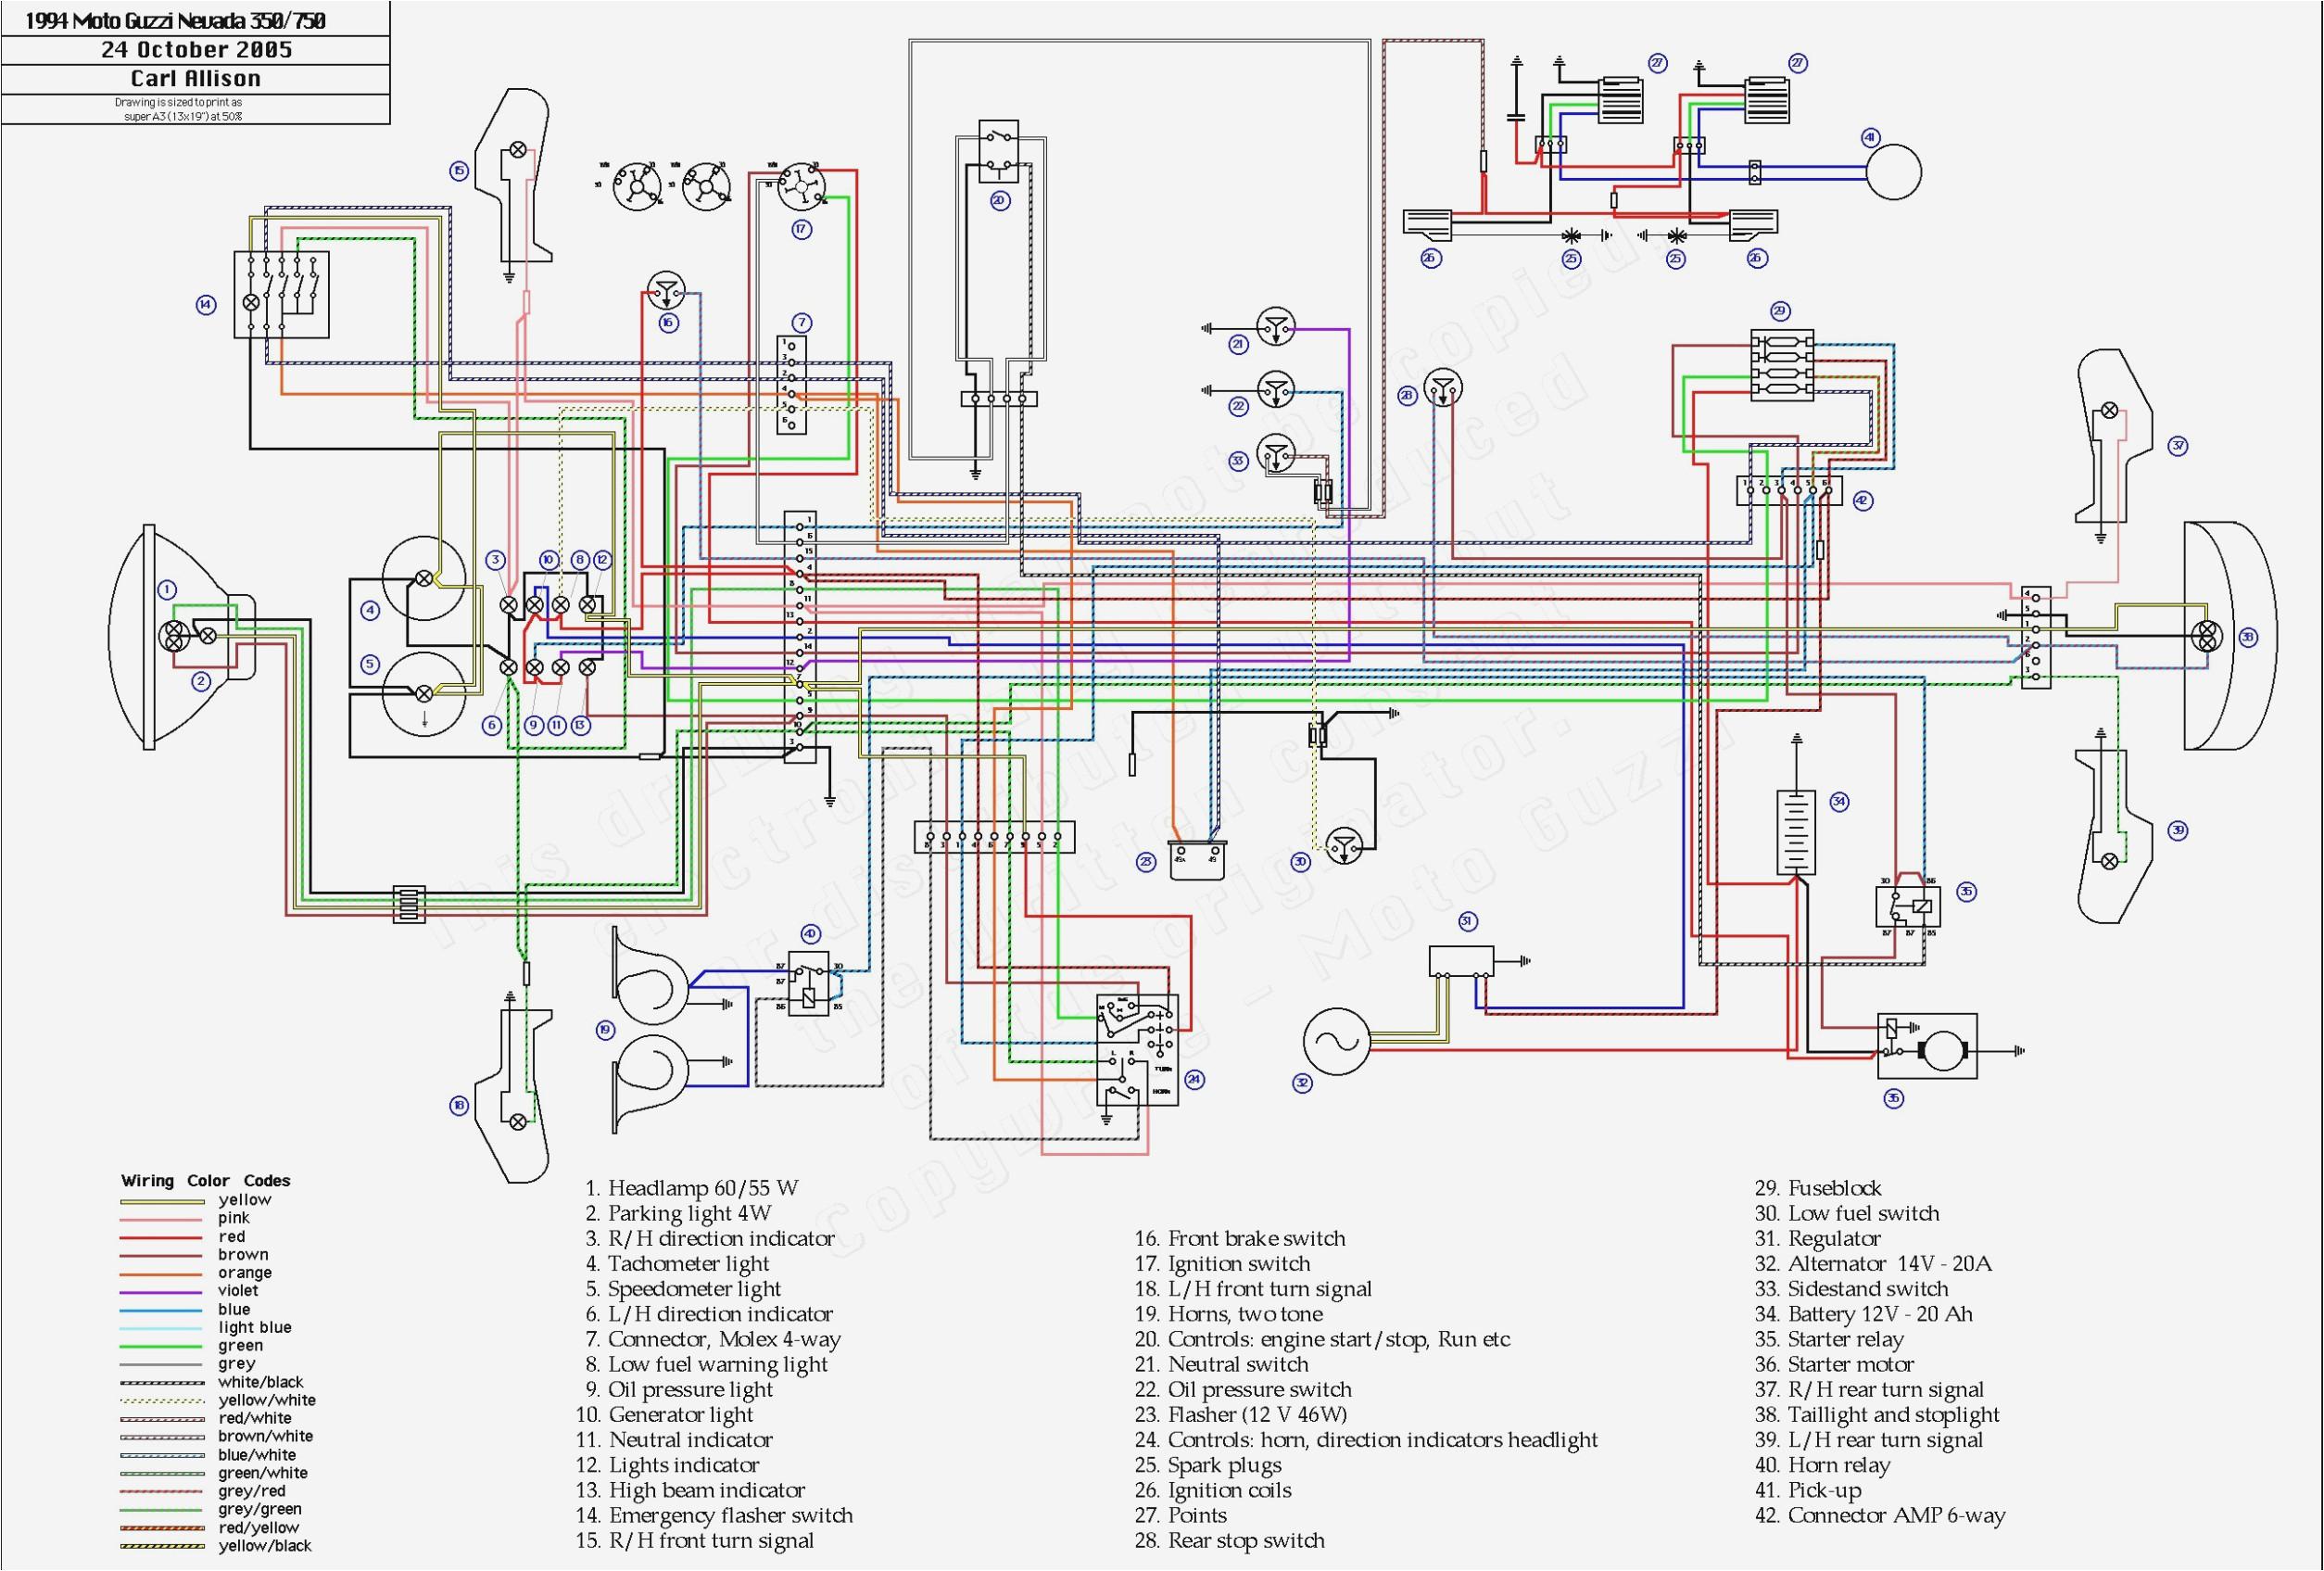 150 yamaha etlf wiring harness wiring diagrams konsult 150 yamaha etlf wiring harness